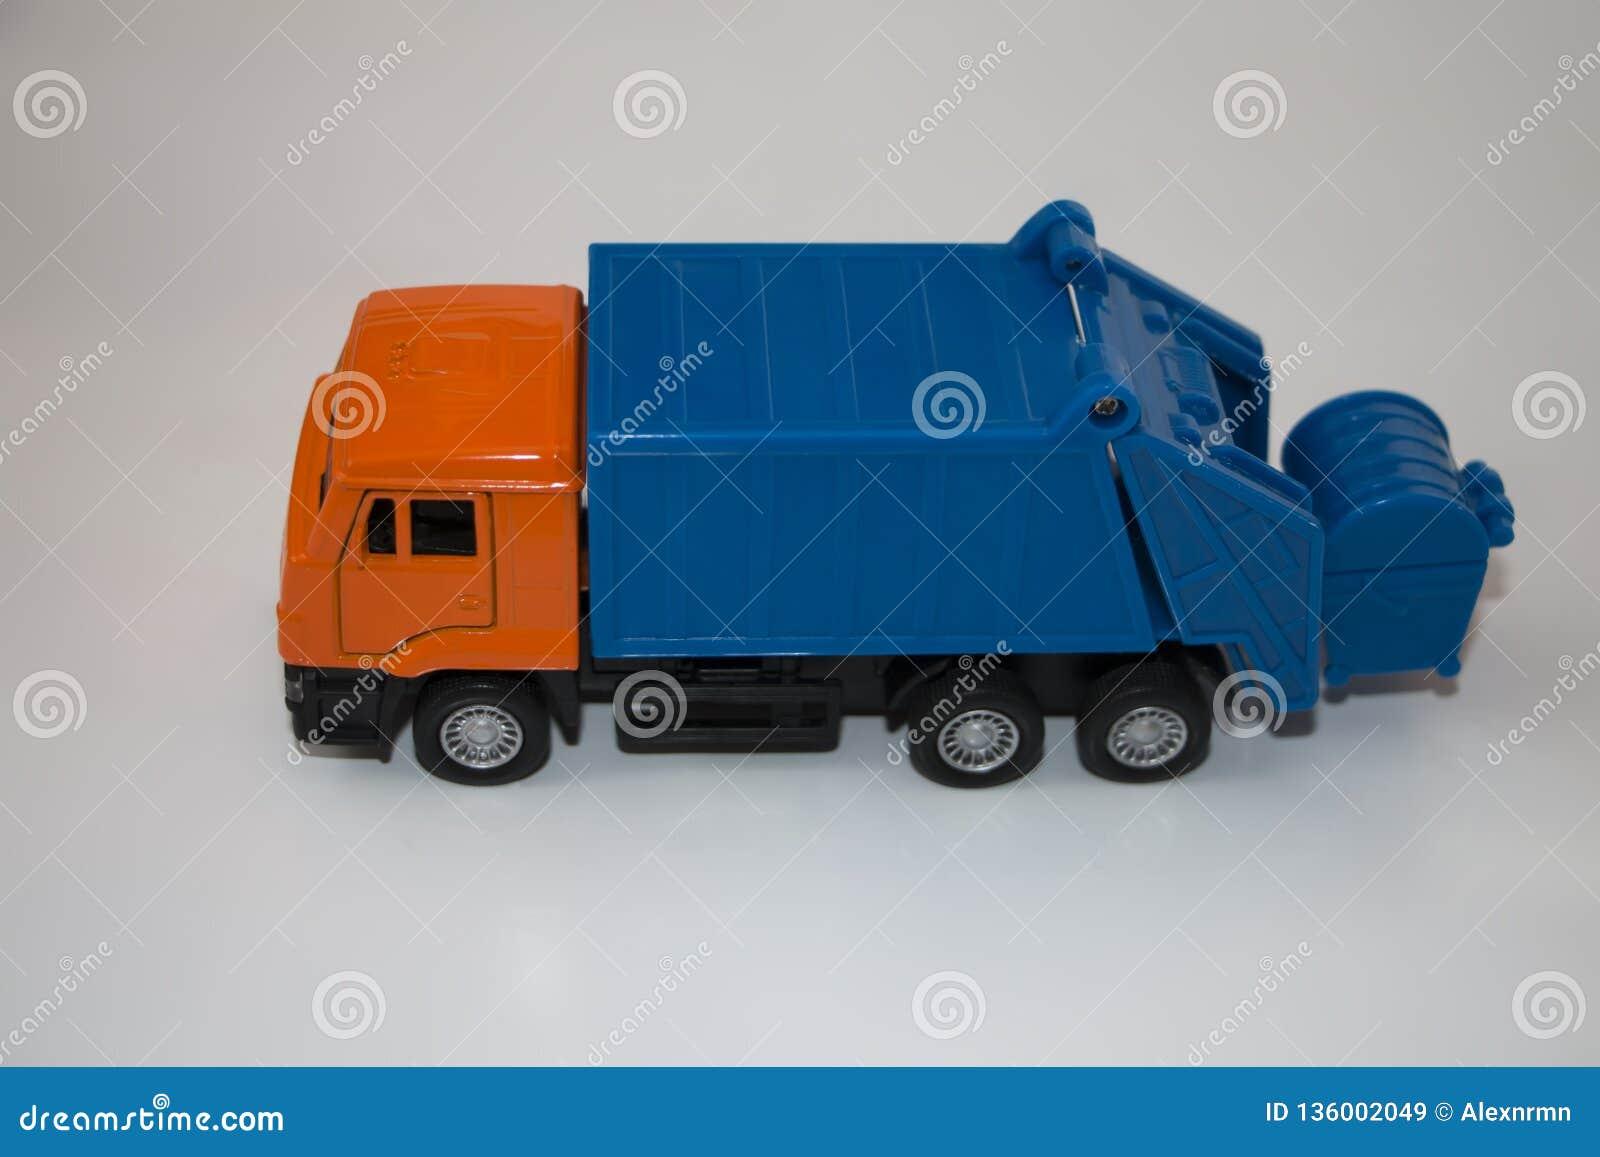 Leksakavskrädelastbil på en vit bakgrund